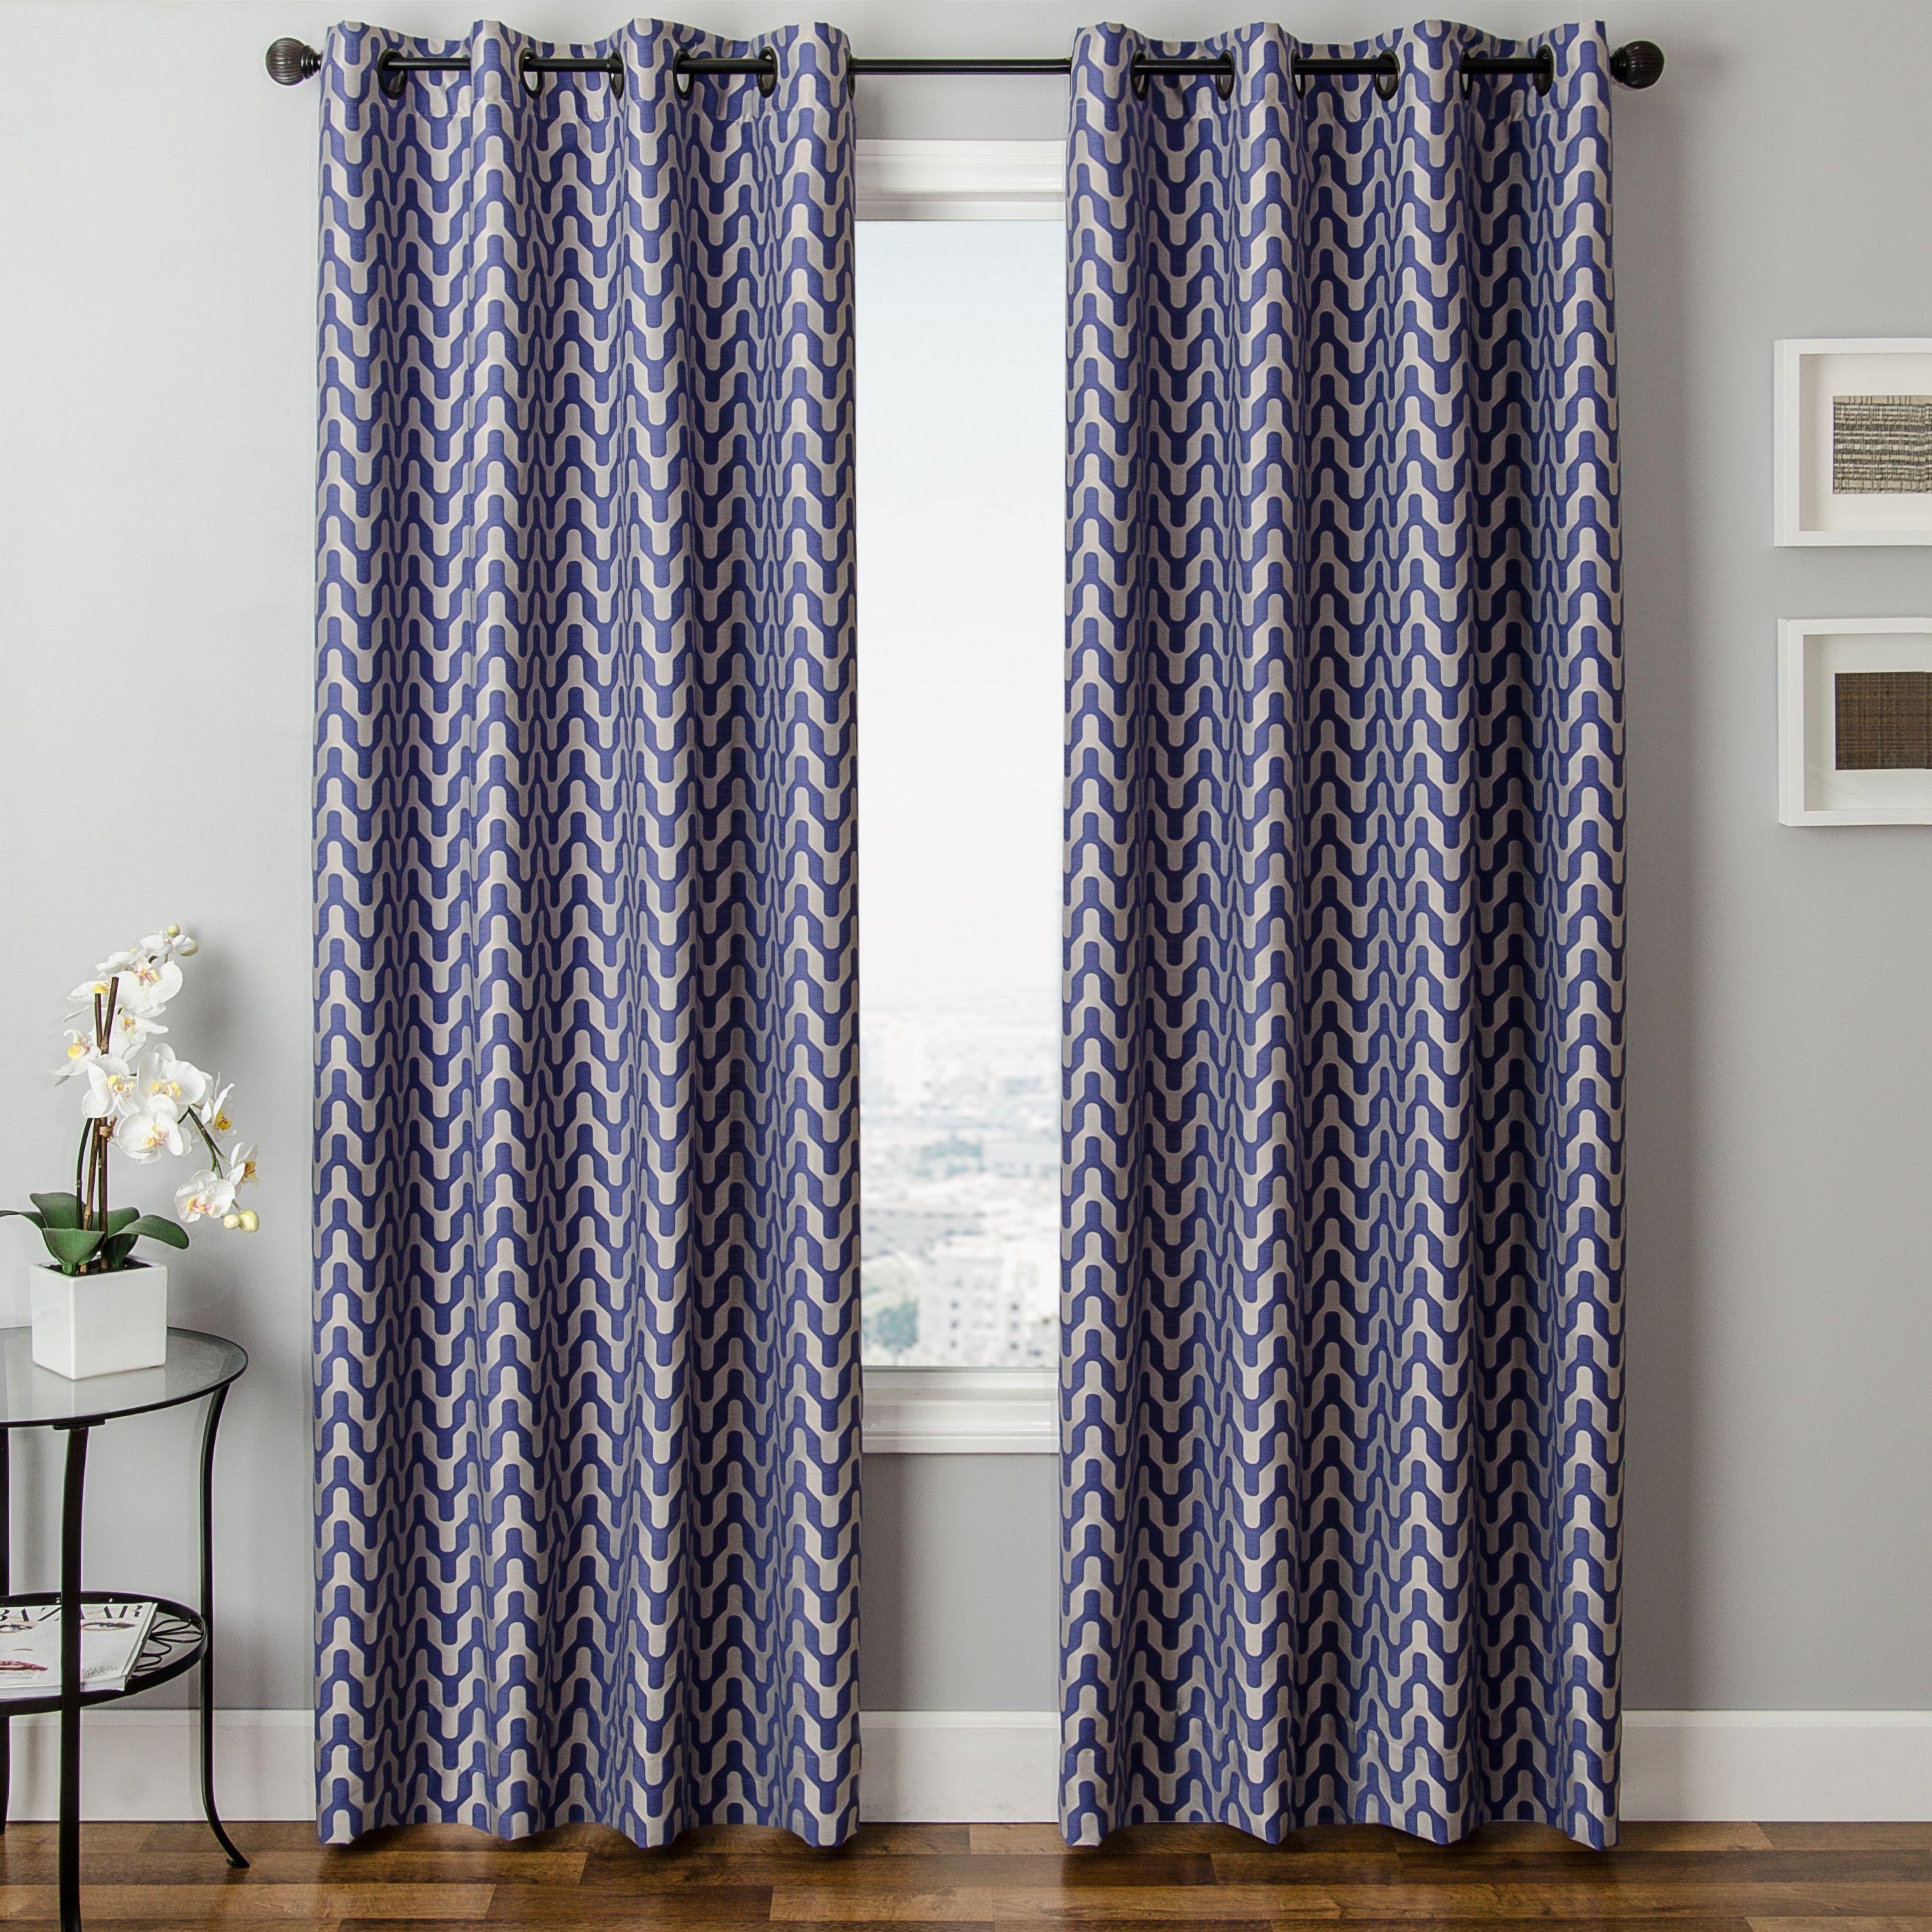 Vaughn 84 Jacquard Chevron Panel Curtain Ashley Furniture Homestore Living Room Drapes Rod Pocket Curtain Panels Panel Curtains